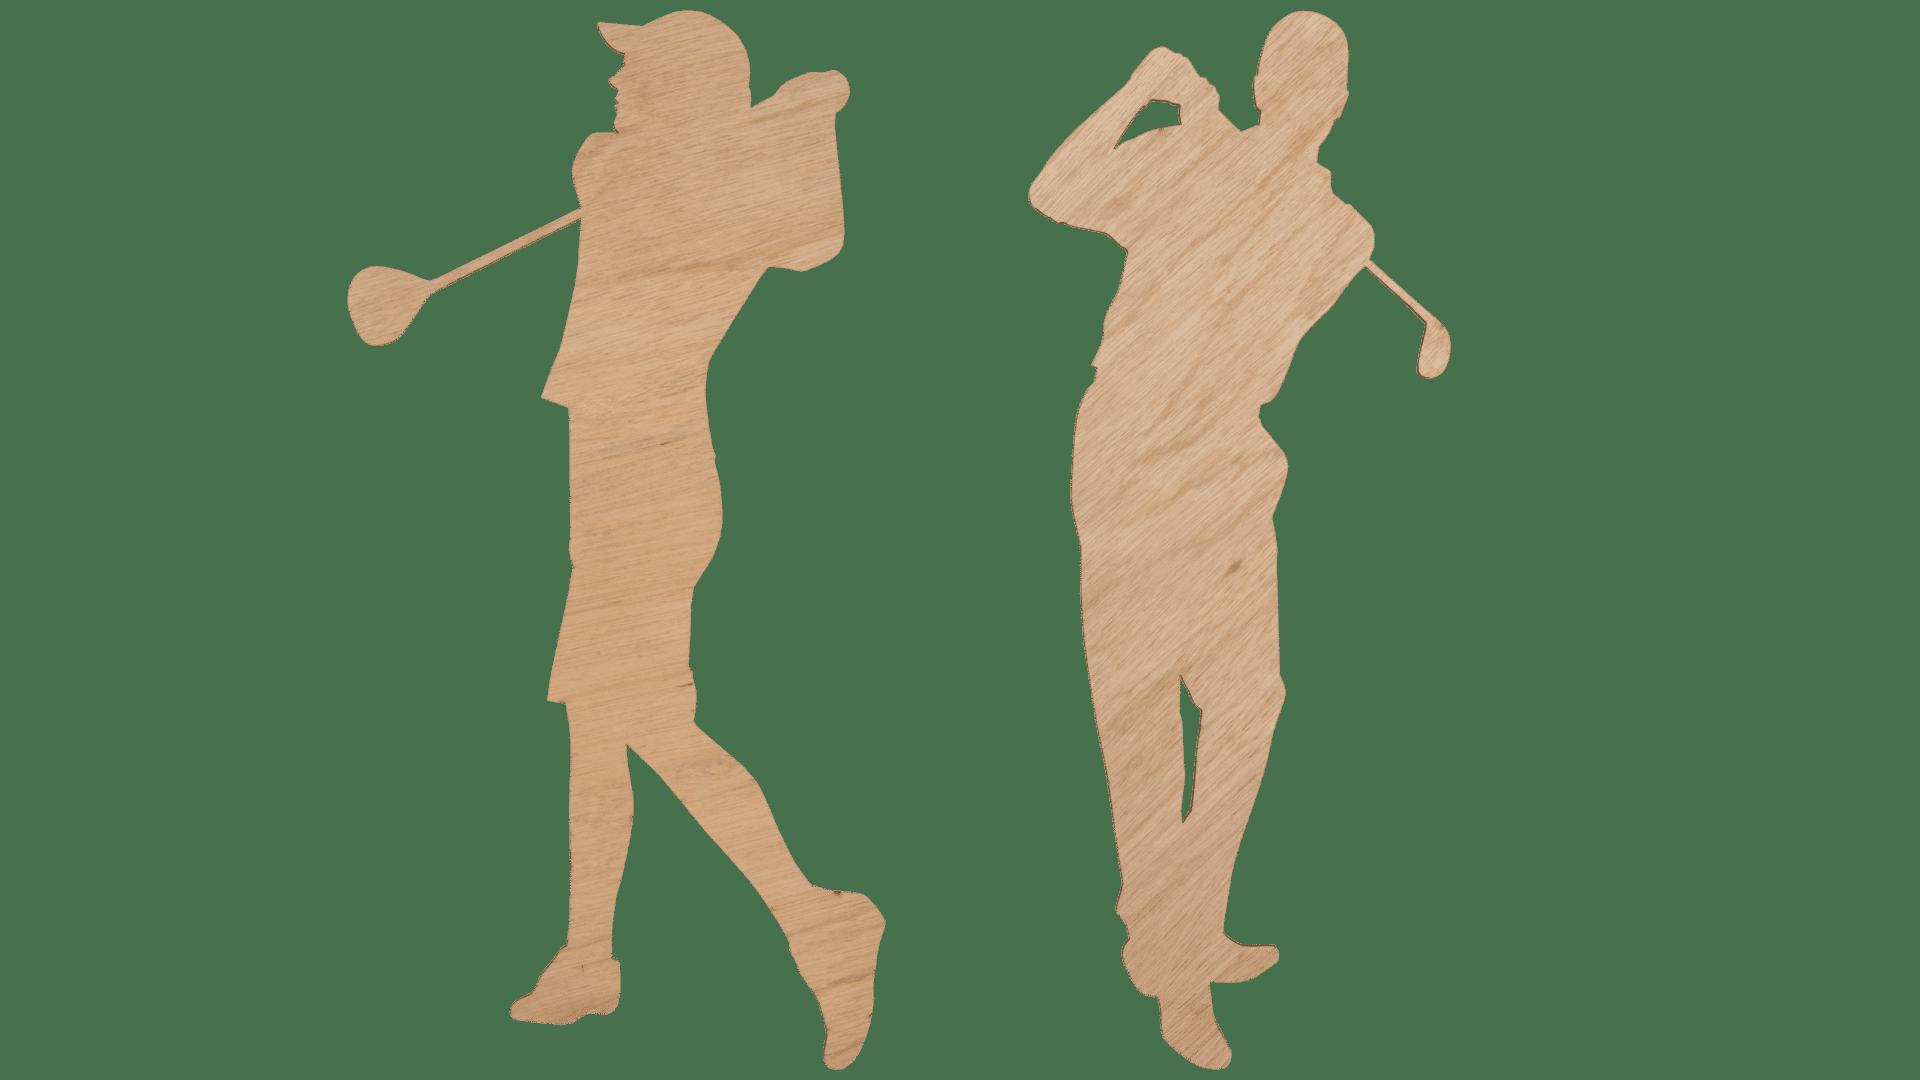 Lady golfer and gentleman golfer